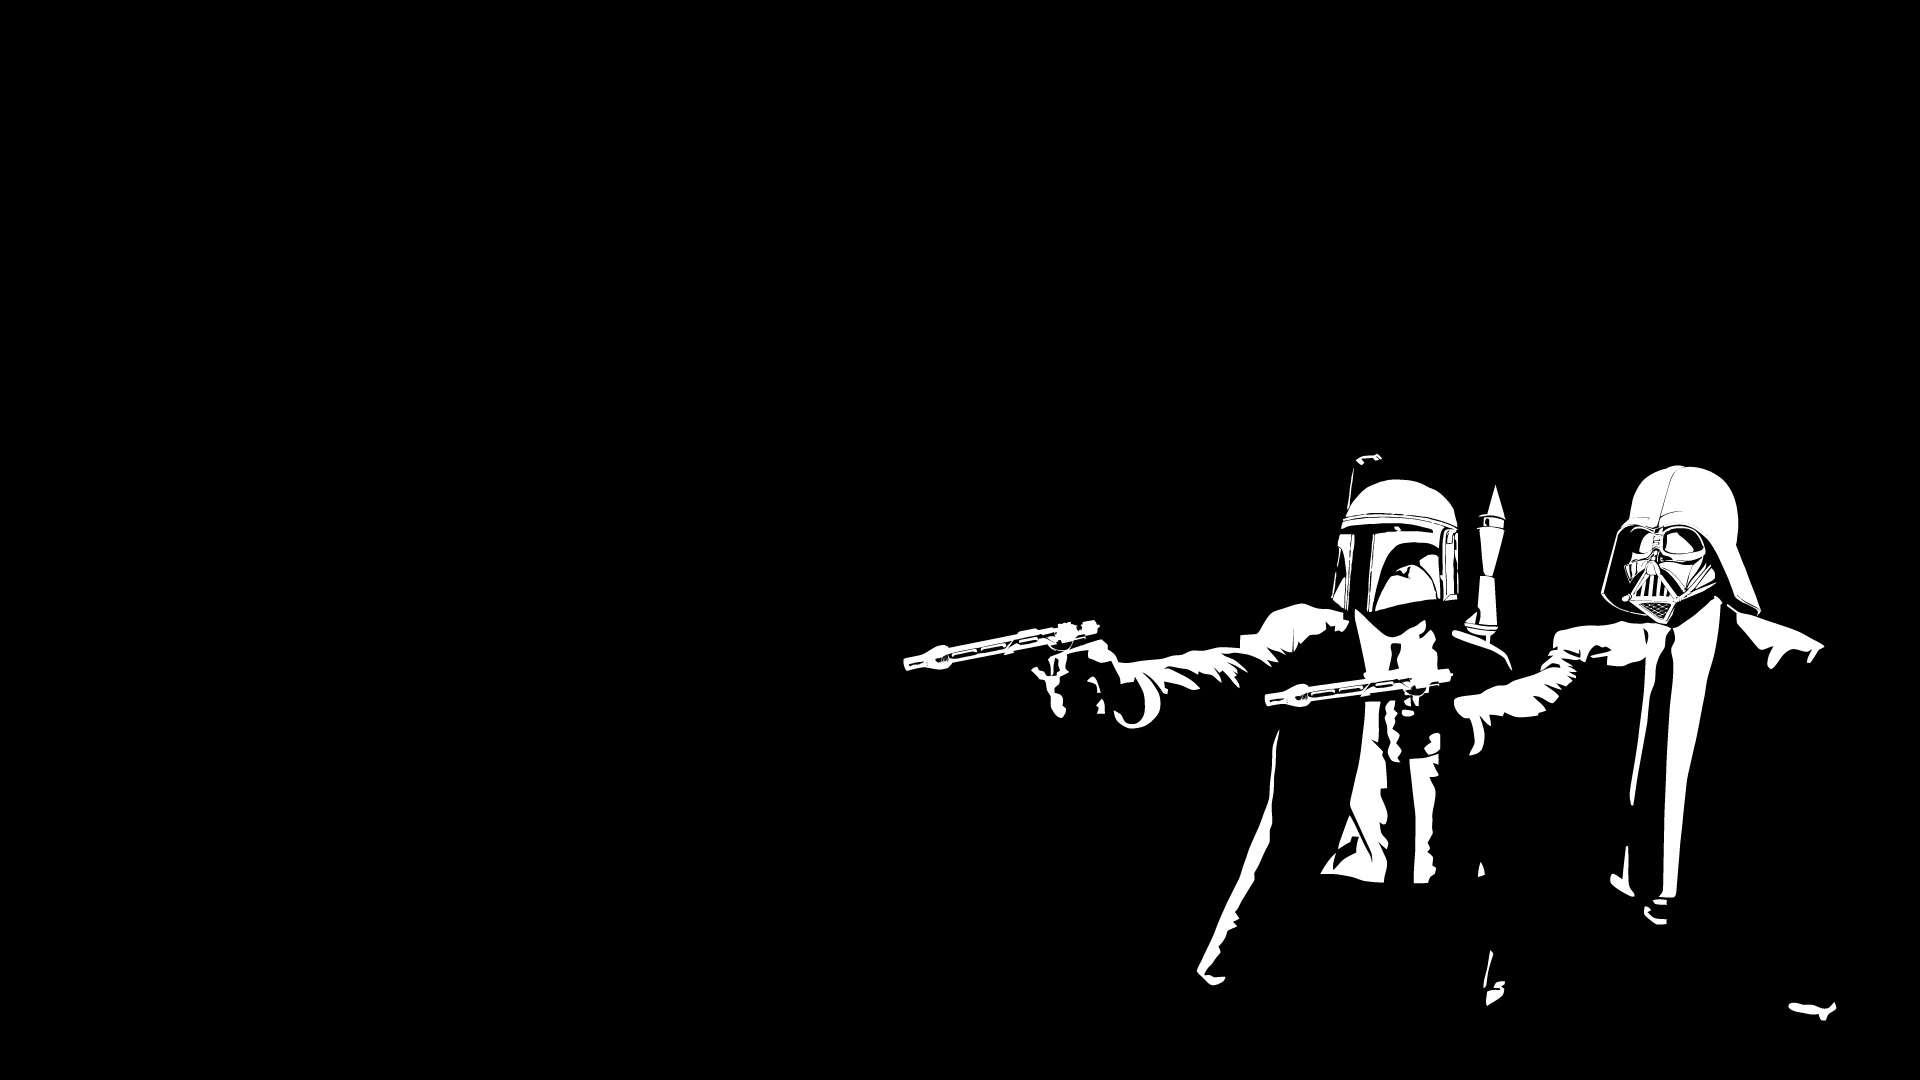 Star Wars Wallpaper 022